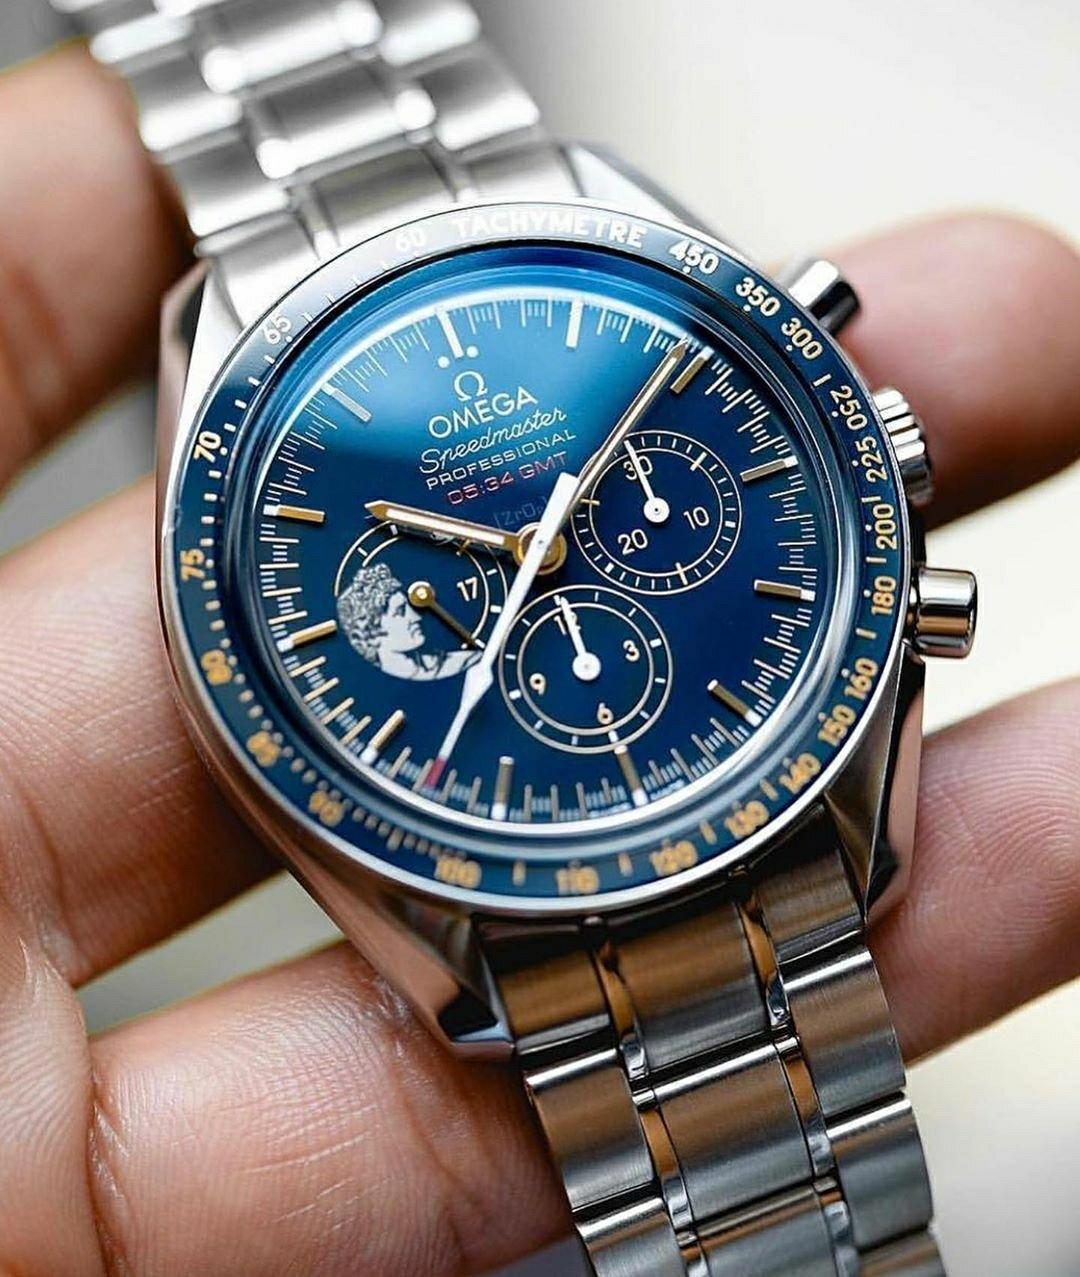 Omega Speedmaster Apollo the 17th